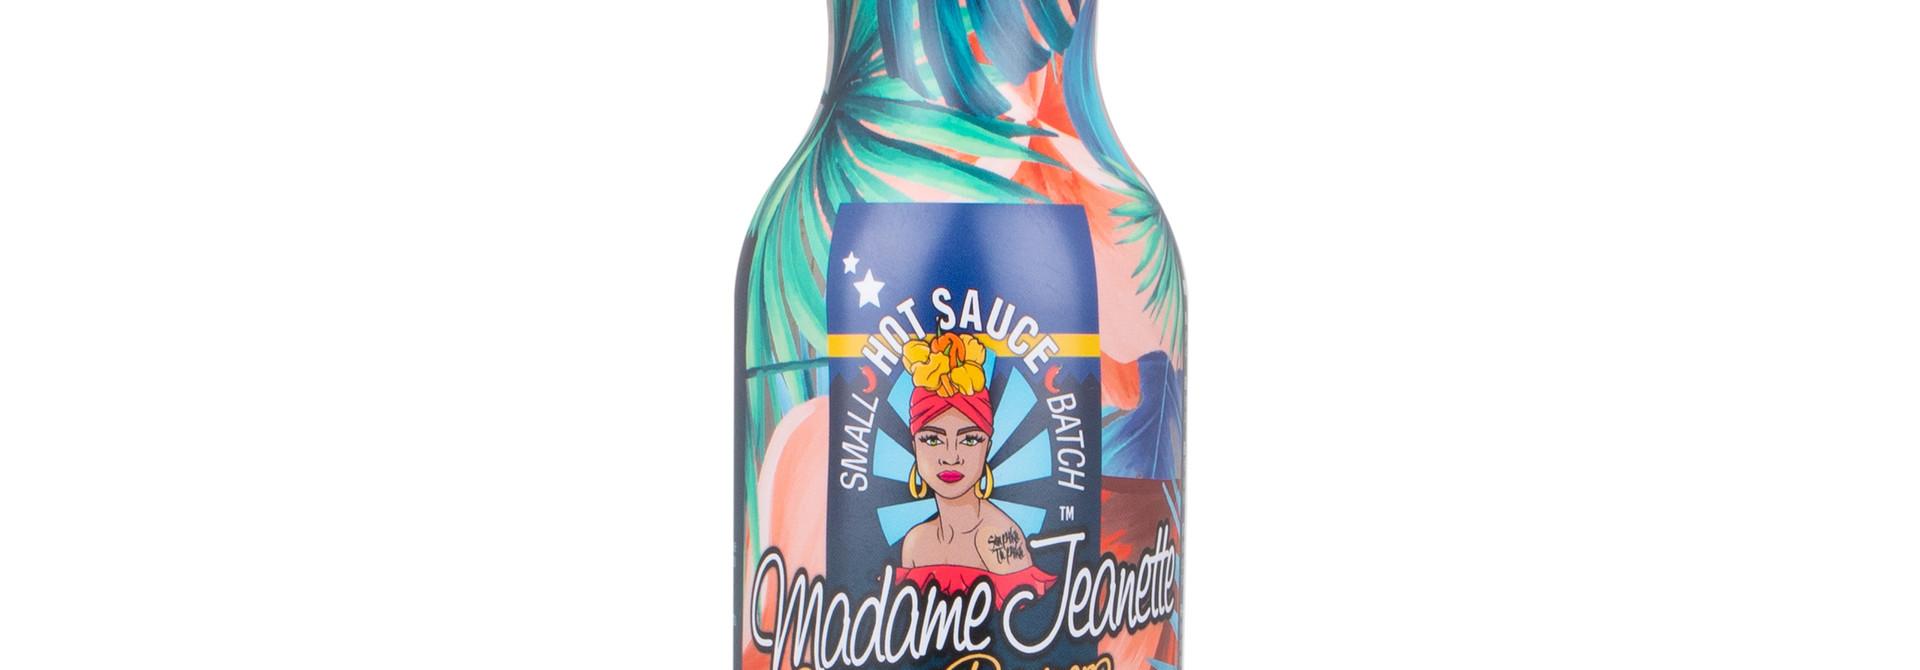 Madame Jeanette Hot Sauce™️ - Curaçao Classic 200ml Glass Bottle